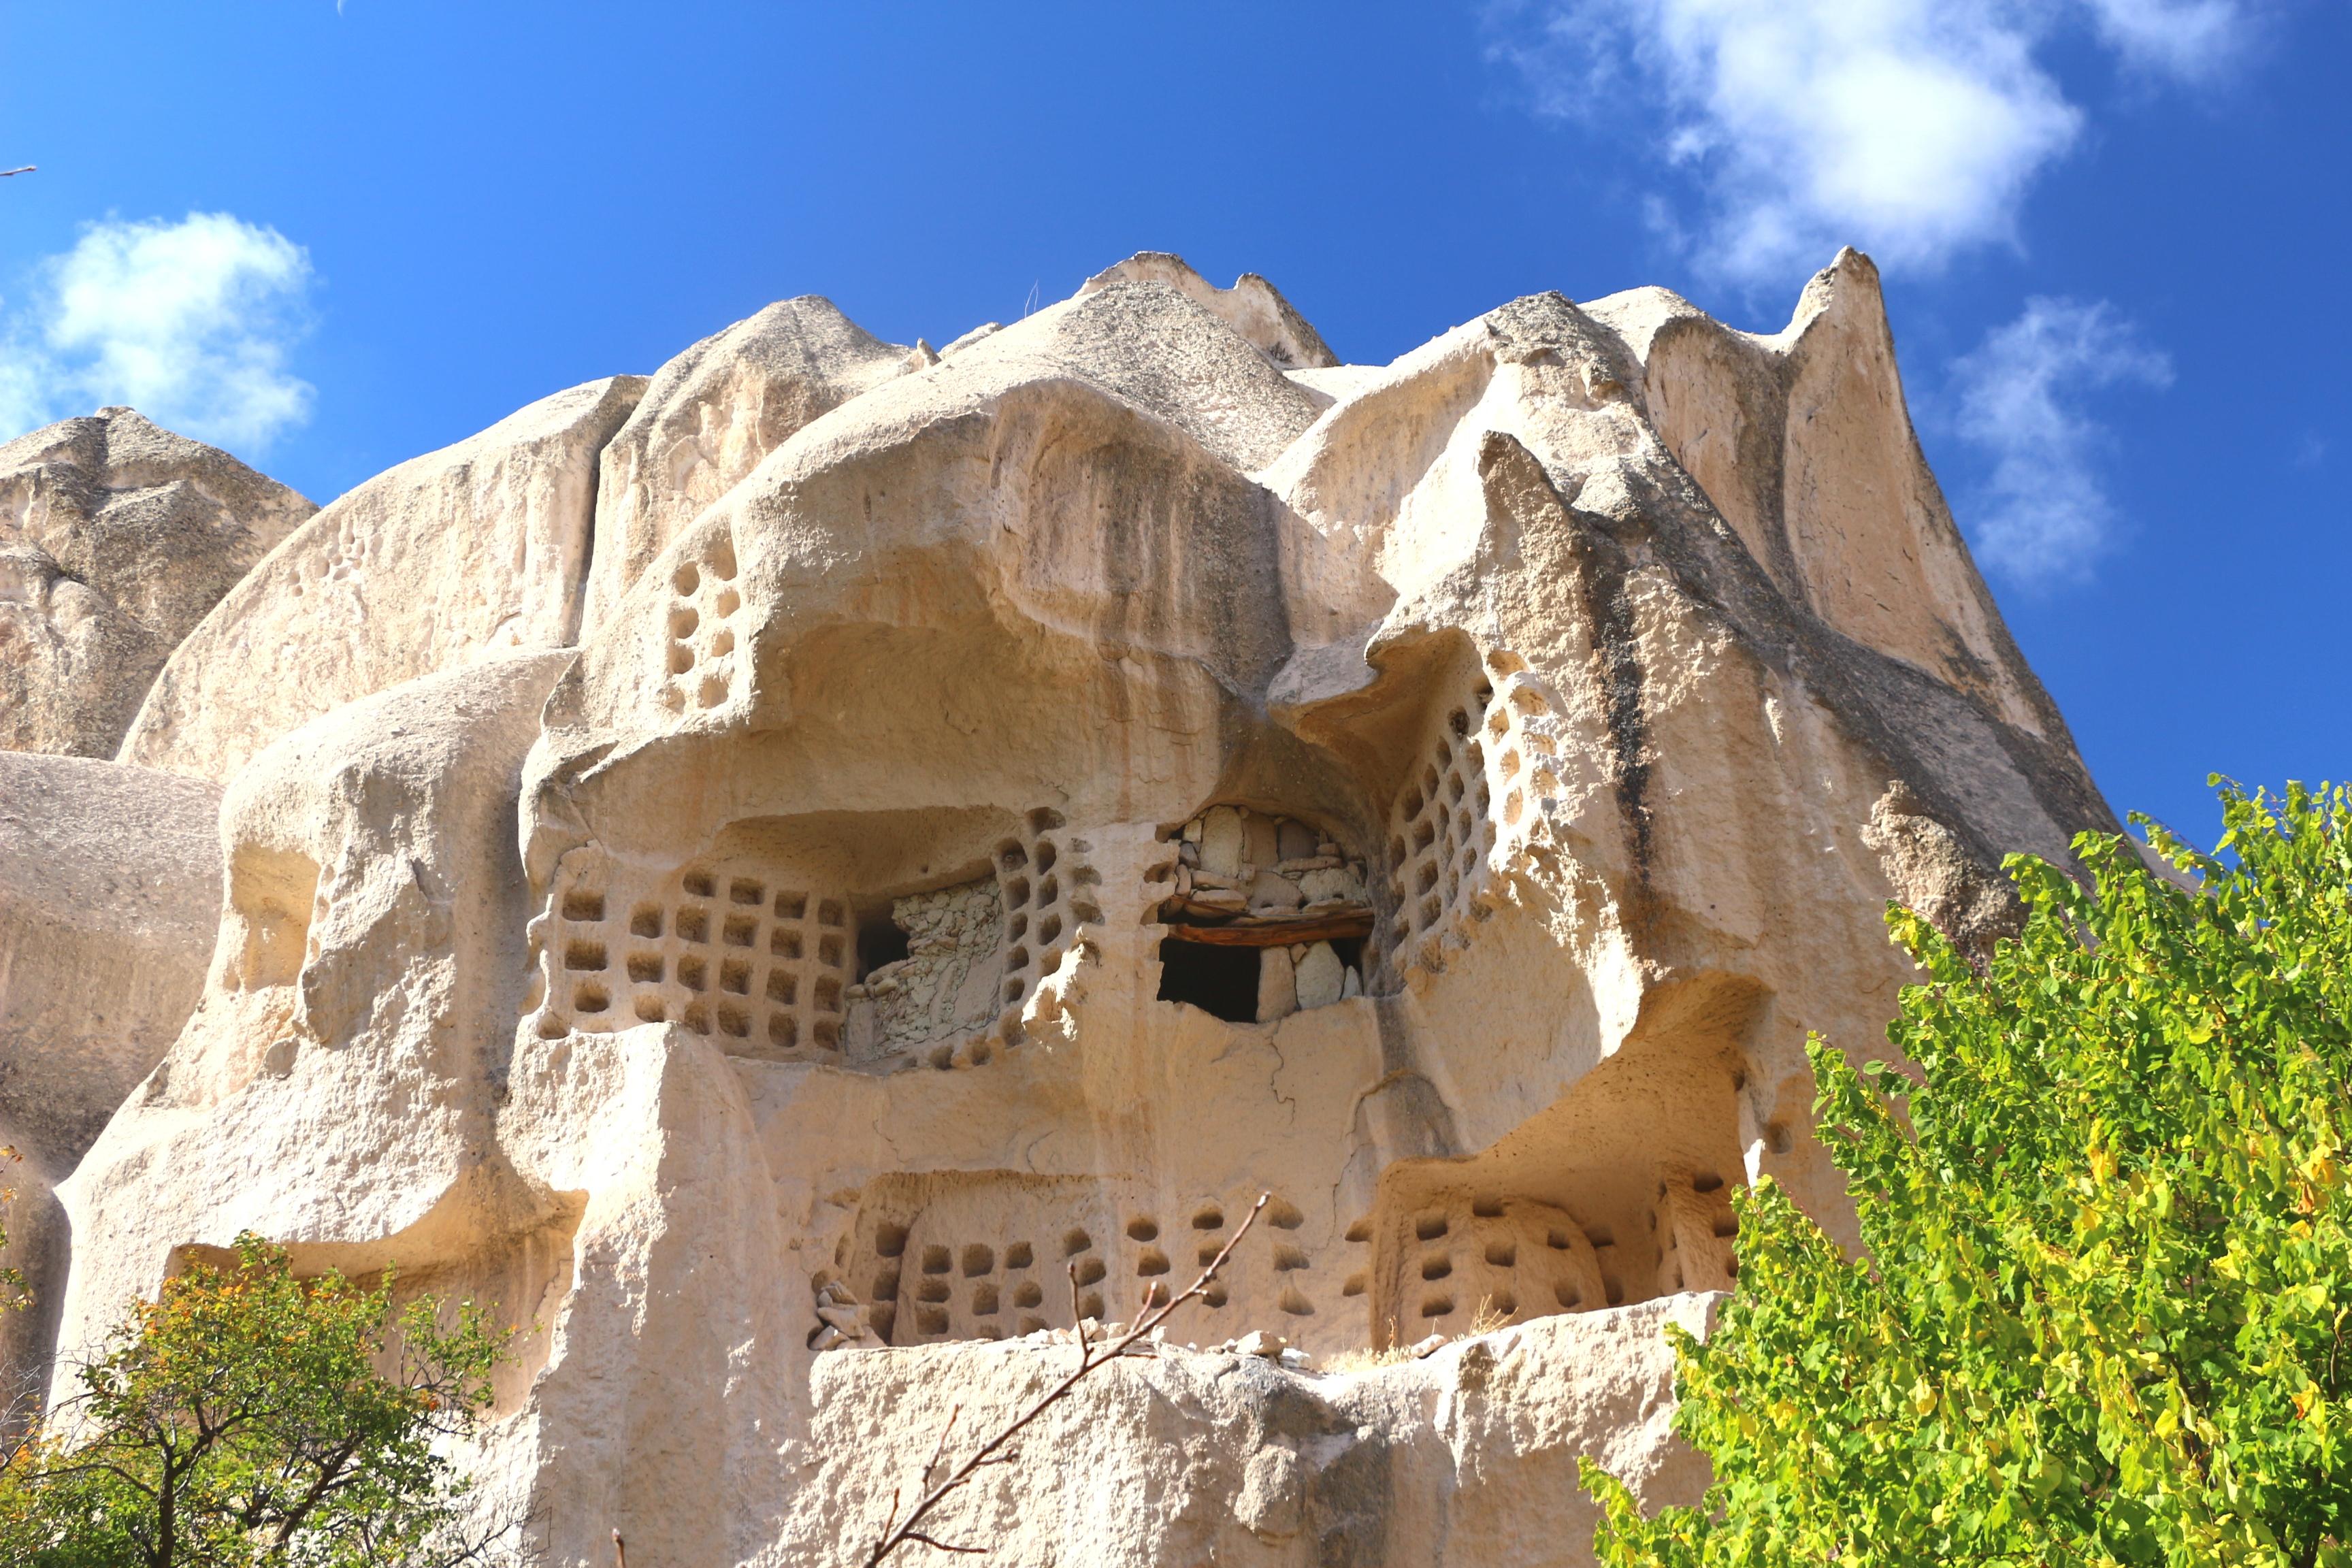 randonnee en cappadoce pigeonnier